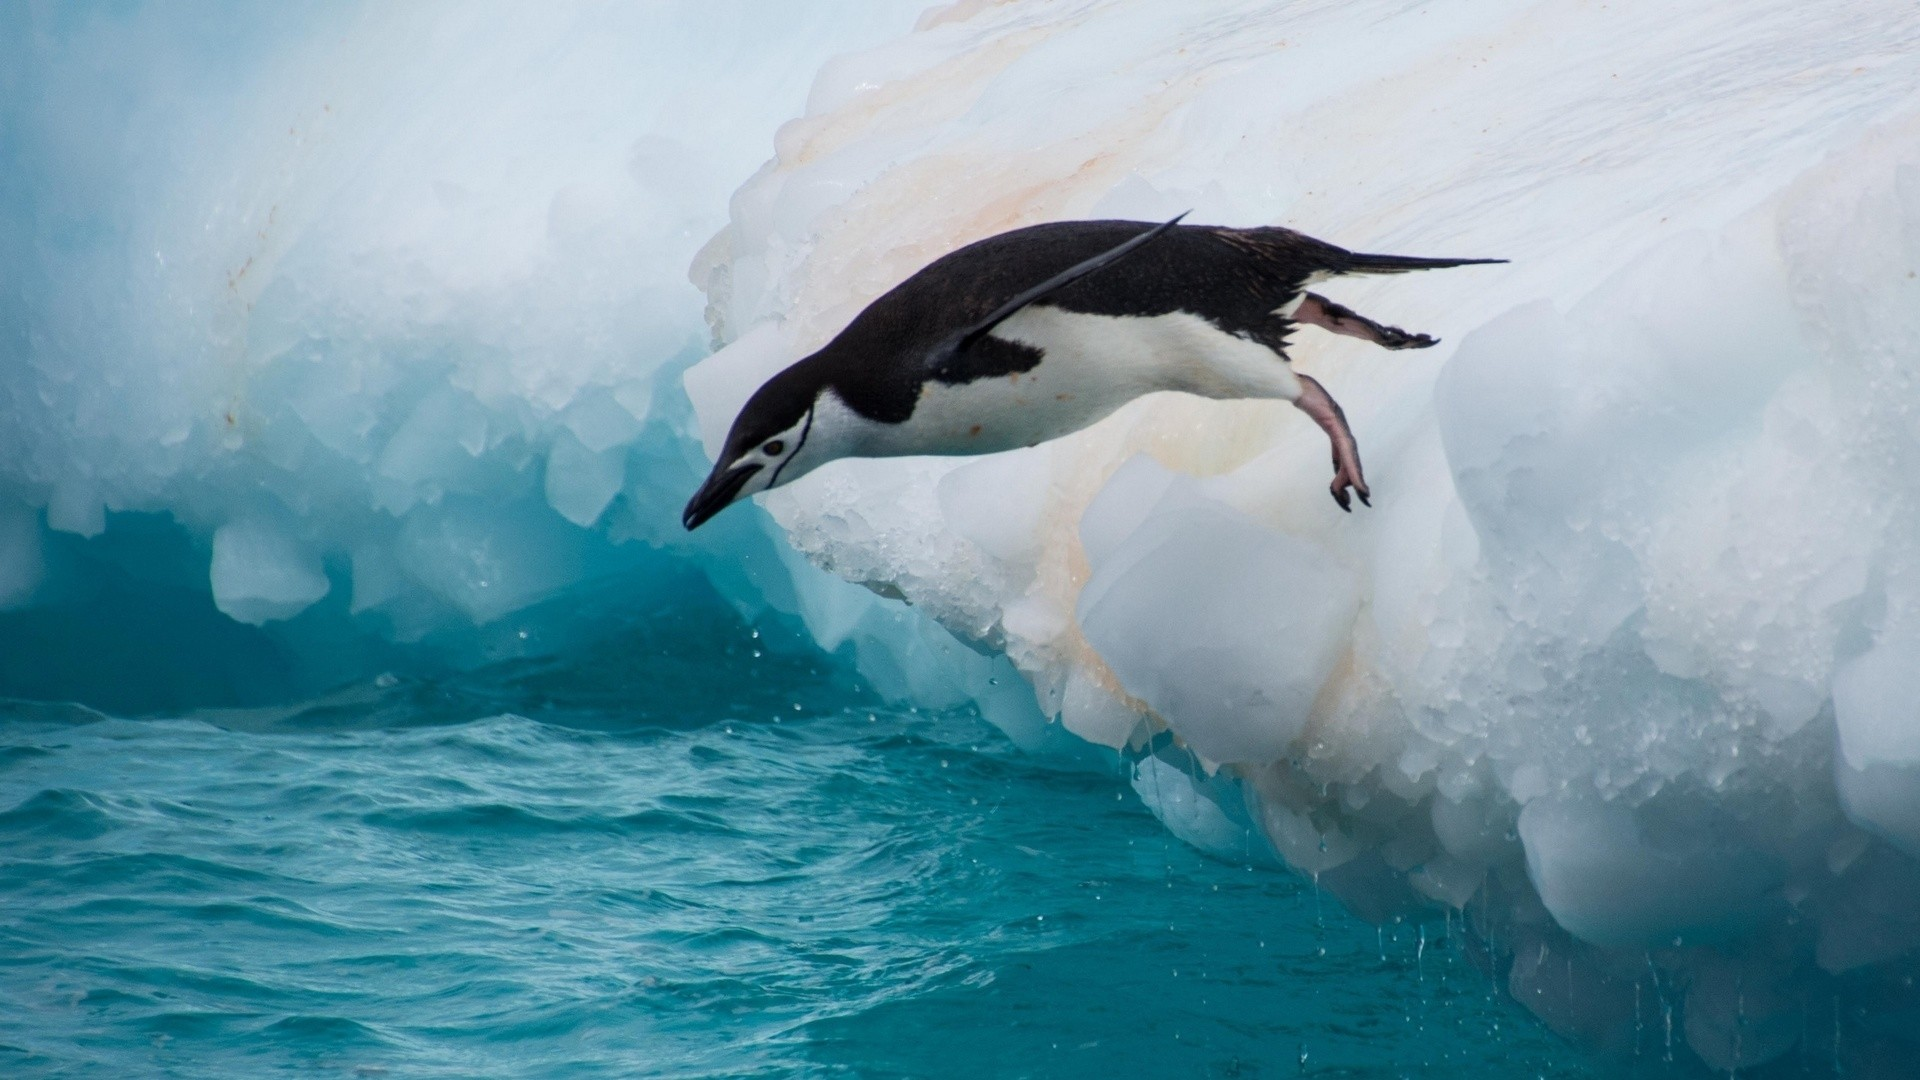 Penguin hd wallpaper download